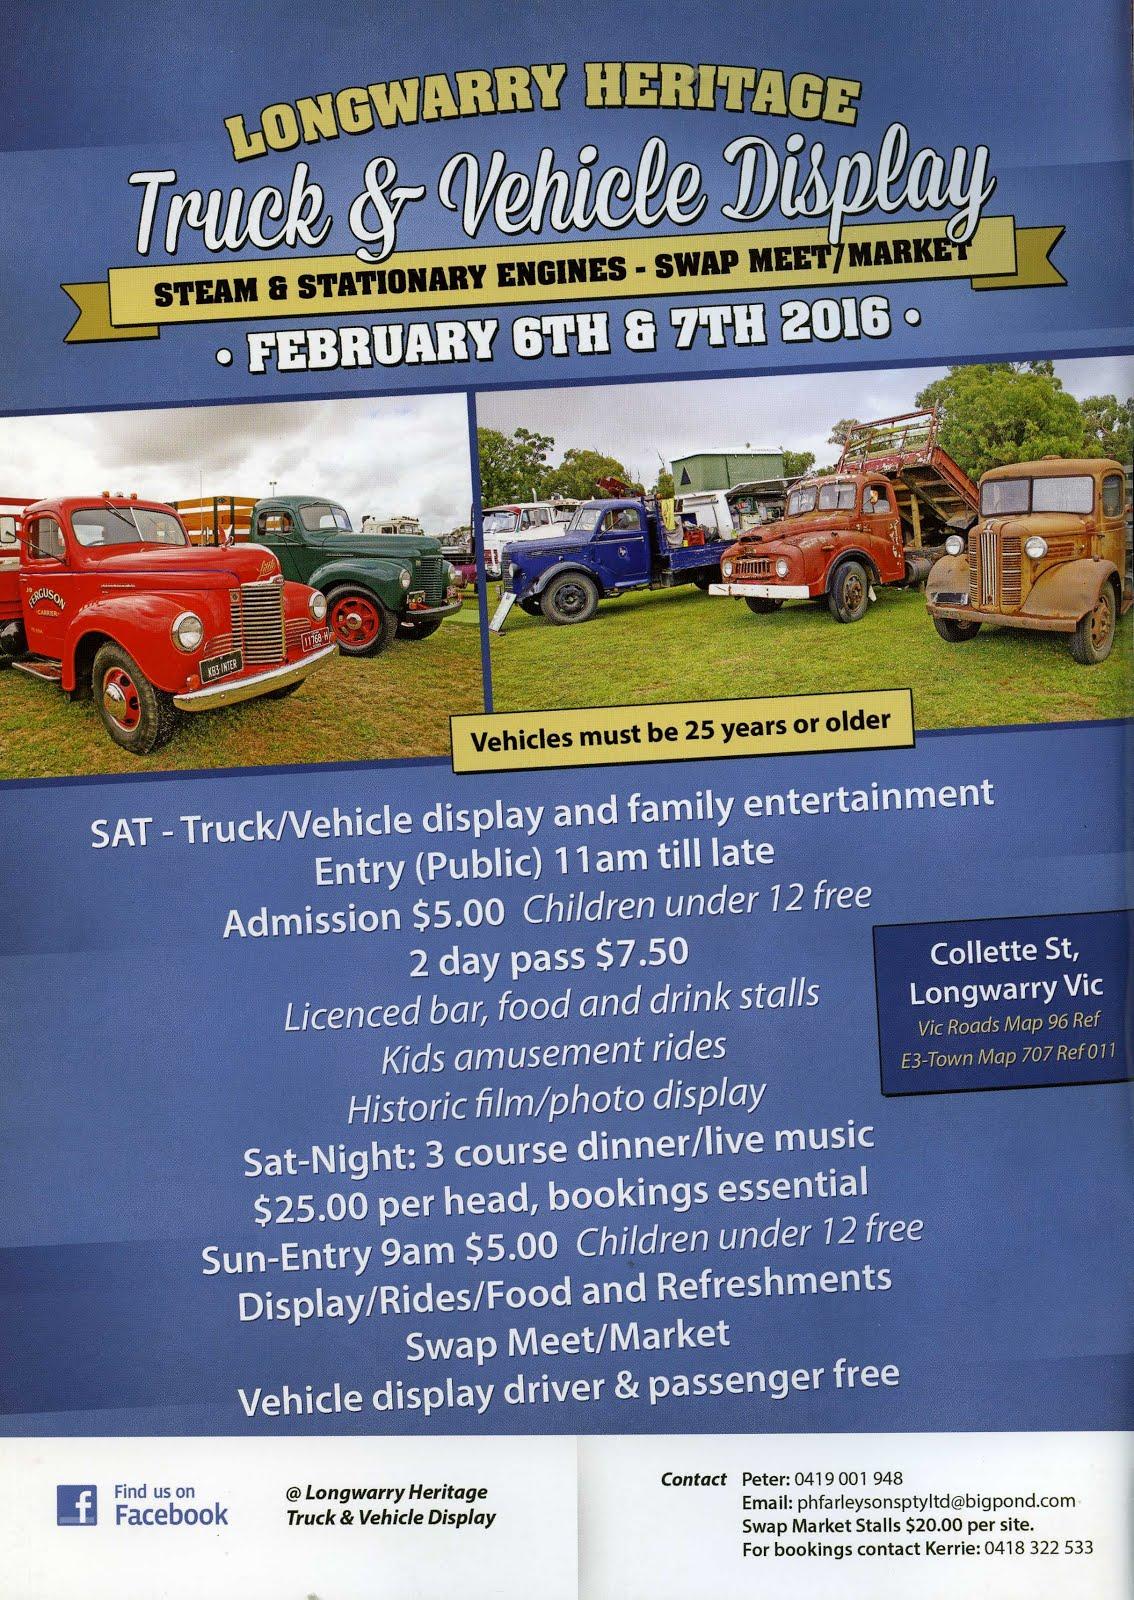 Longwarry Heritage Truck Show February 6 & 7 2016